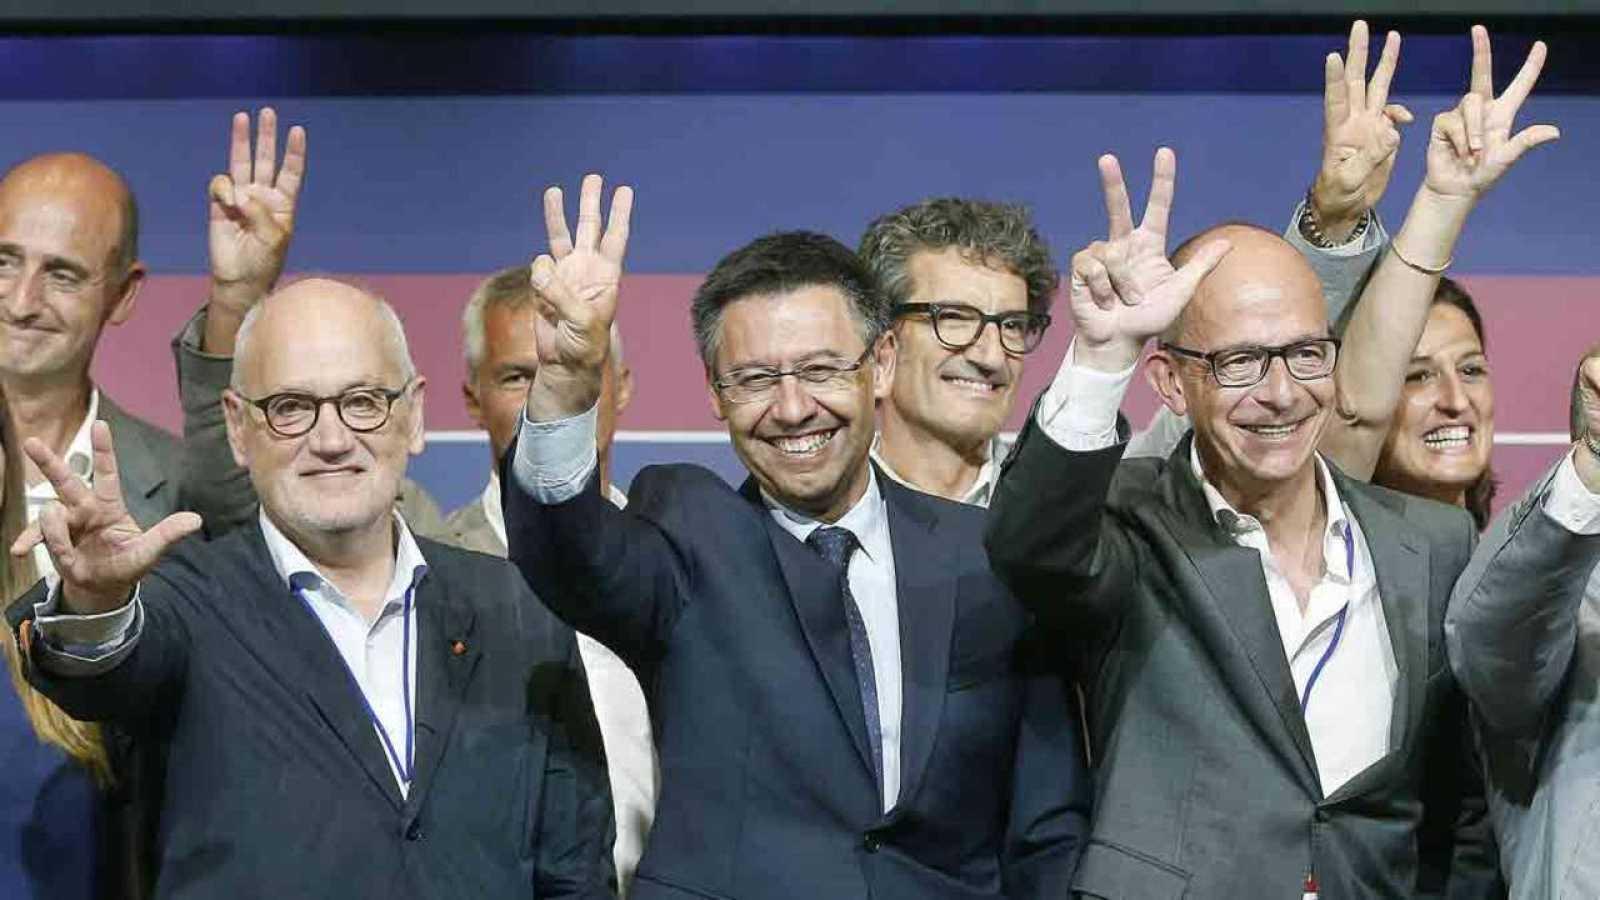 Josep Maria Bartomeu junto a su equipo, tras proclamarse presidente del FC Barcelona.